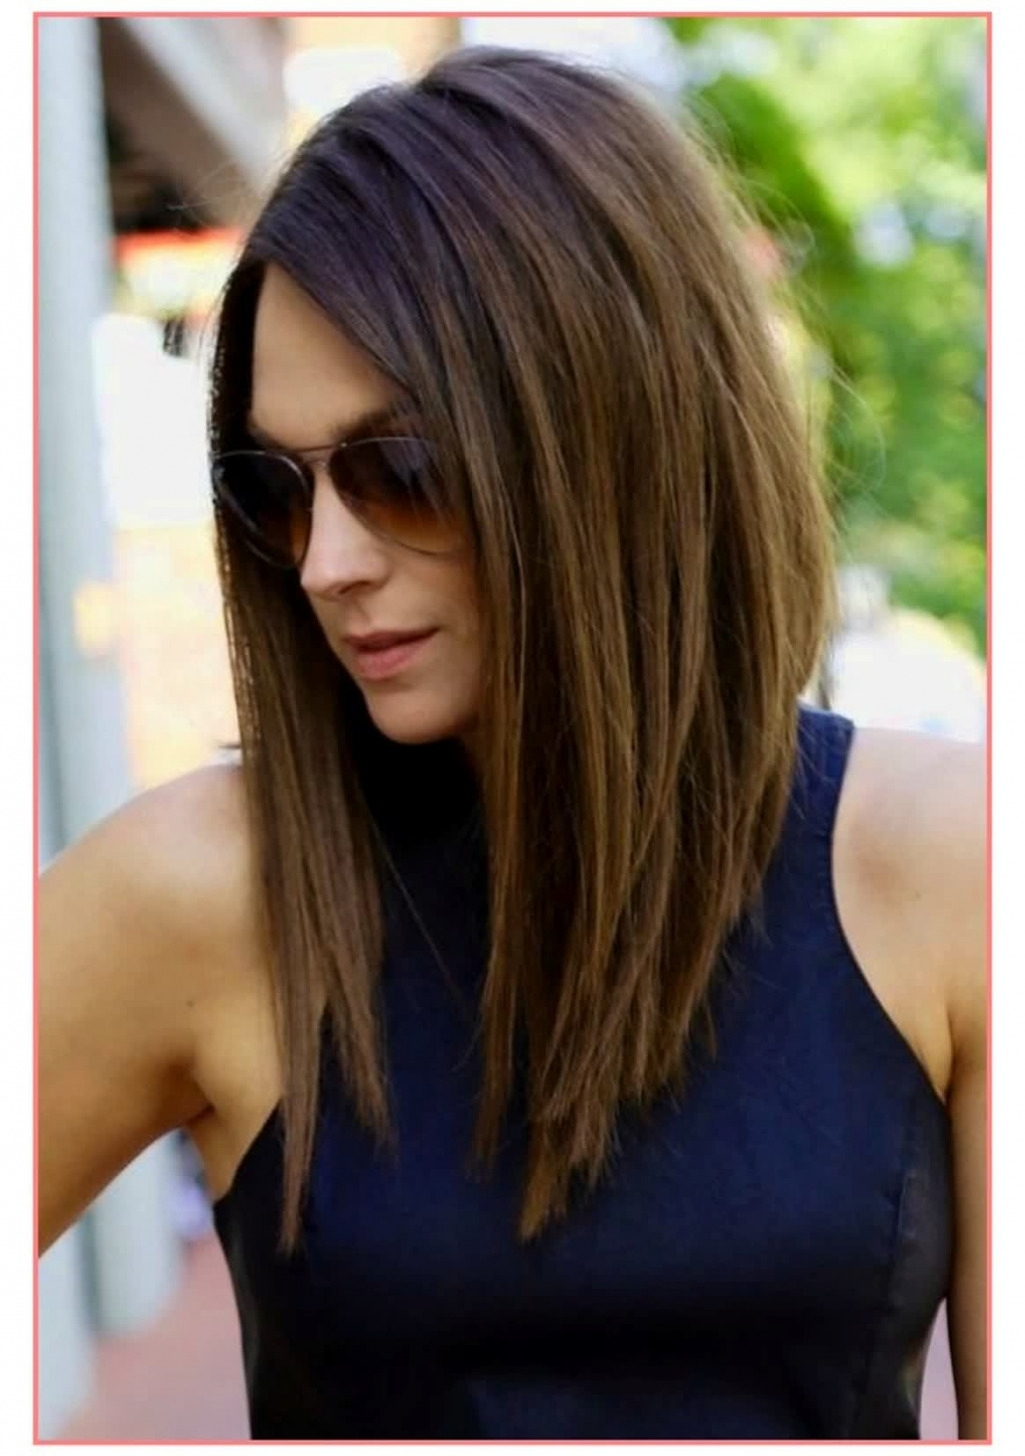 Medium Hairstyles For Women 2018 Amazing Hair Ideas Medium Length inside Haircuts 2018 Female Shoulder Length